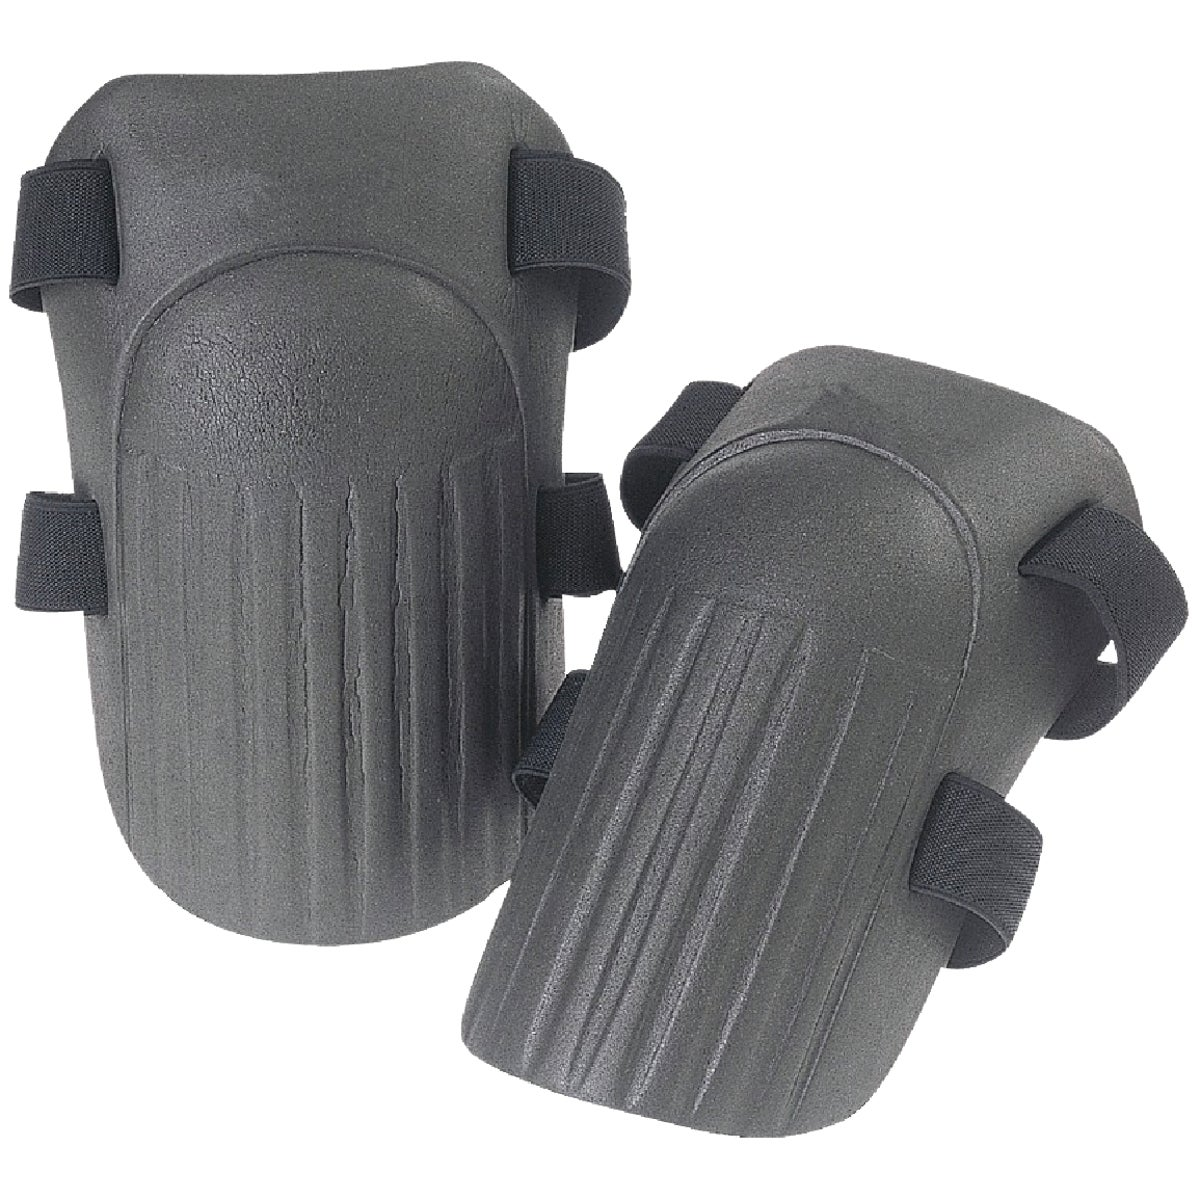 Durable Foam Kneepads